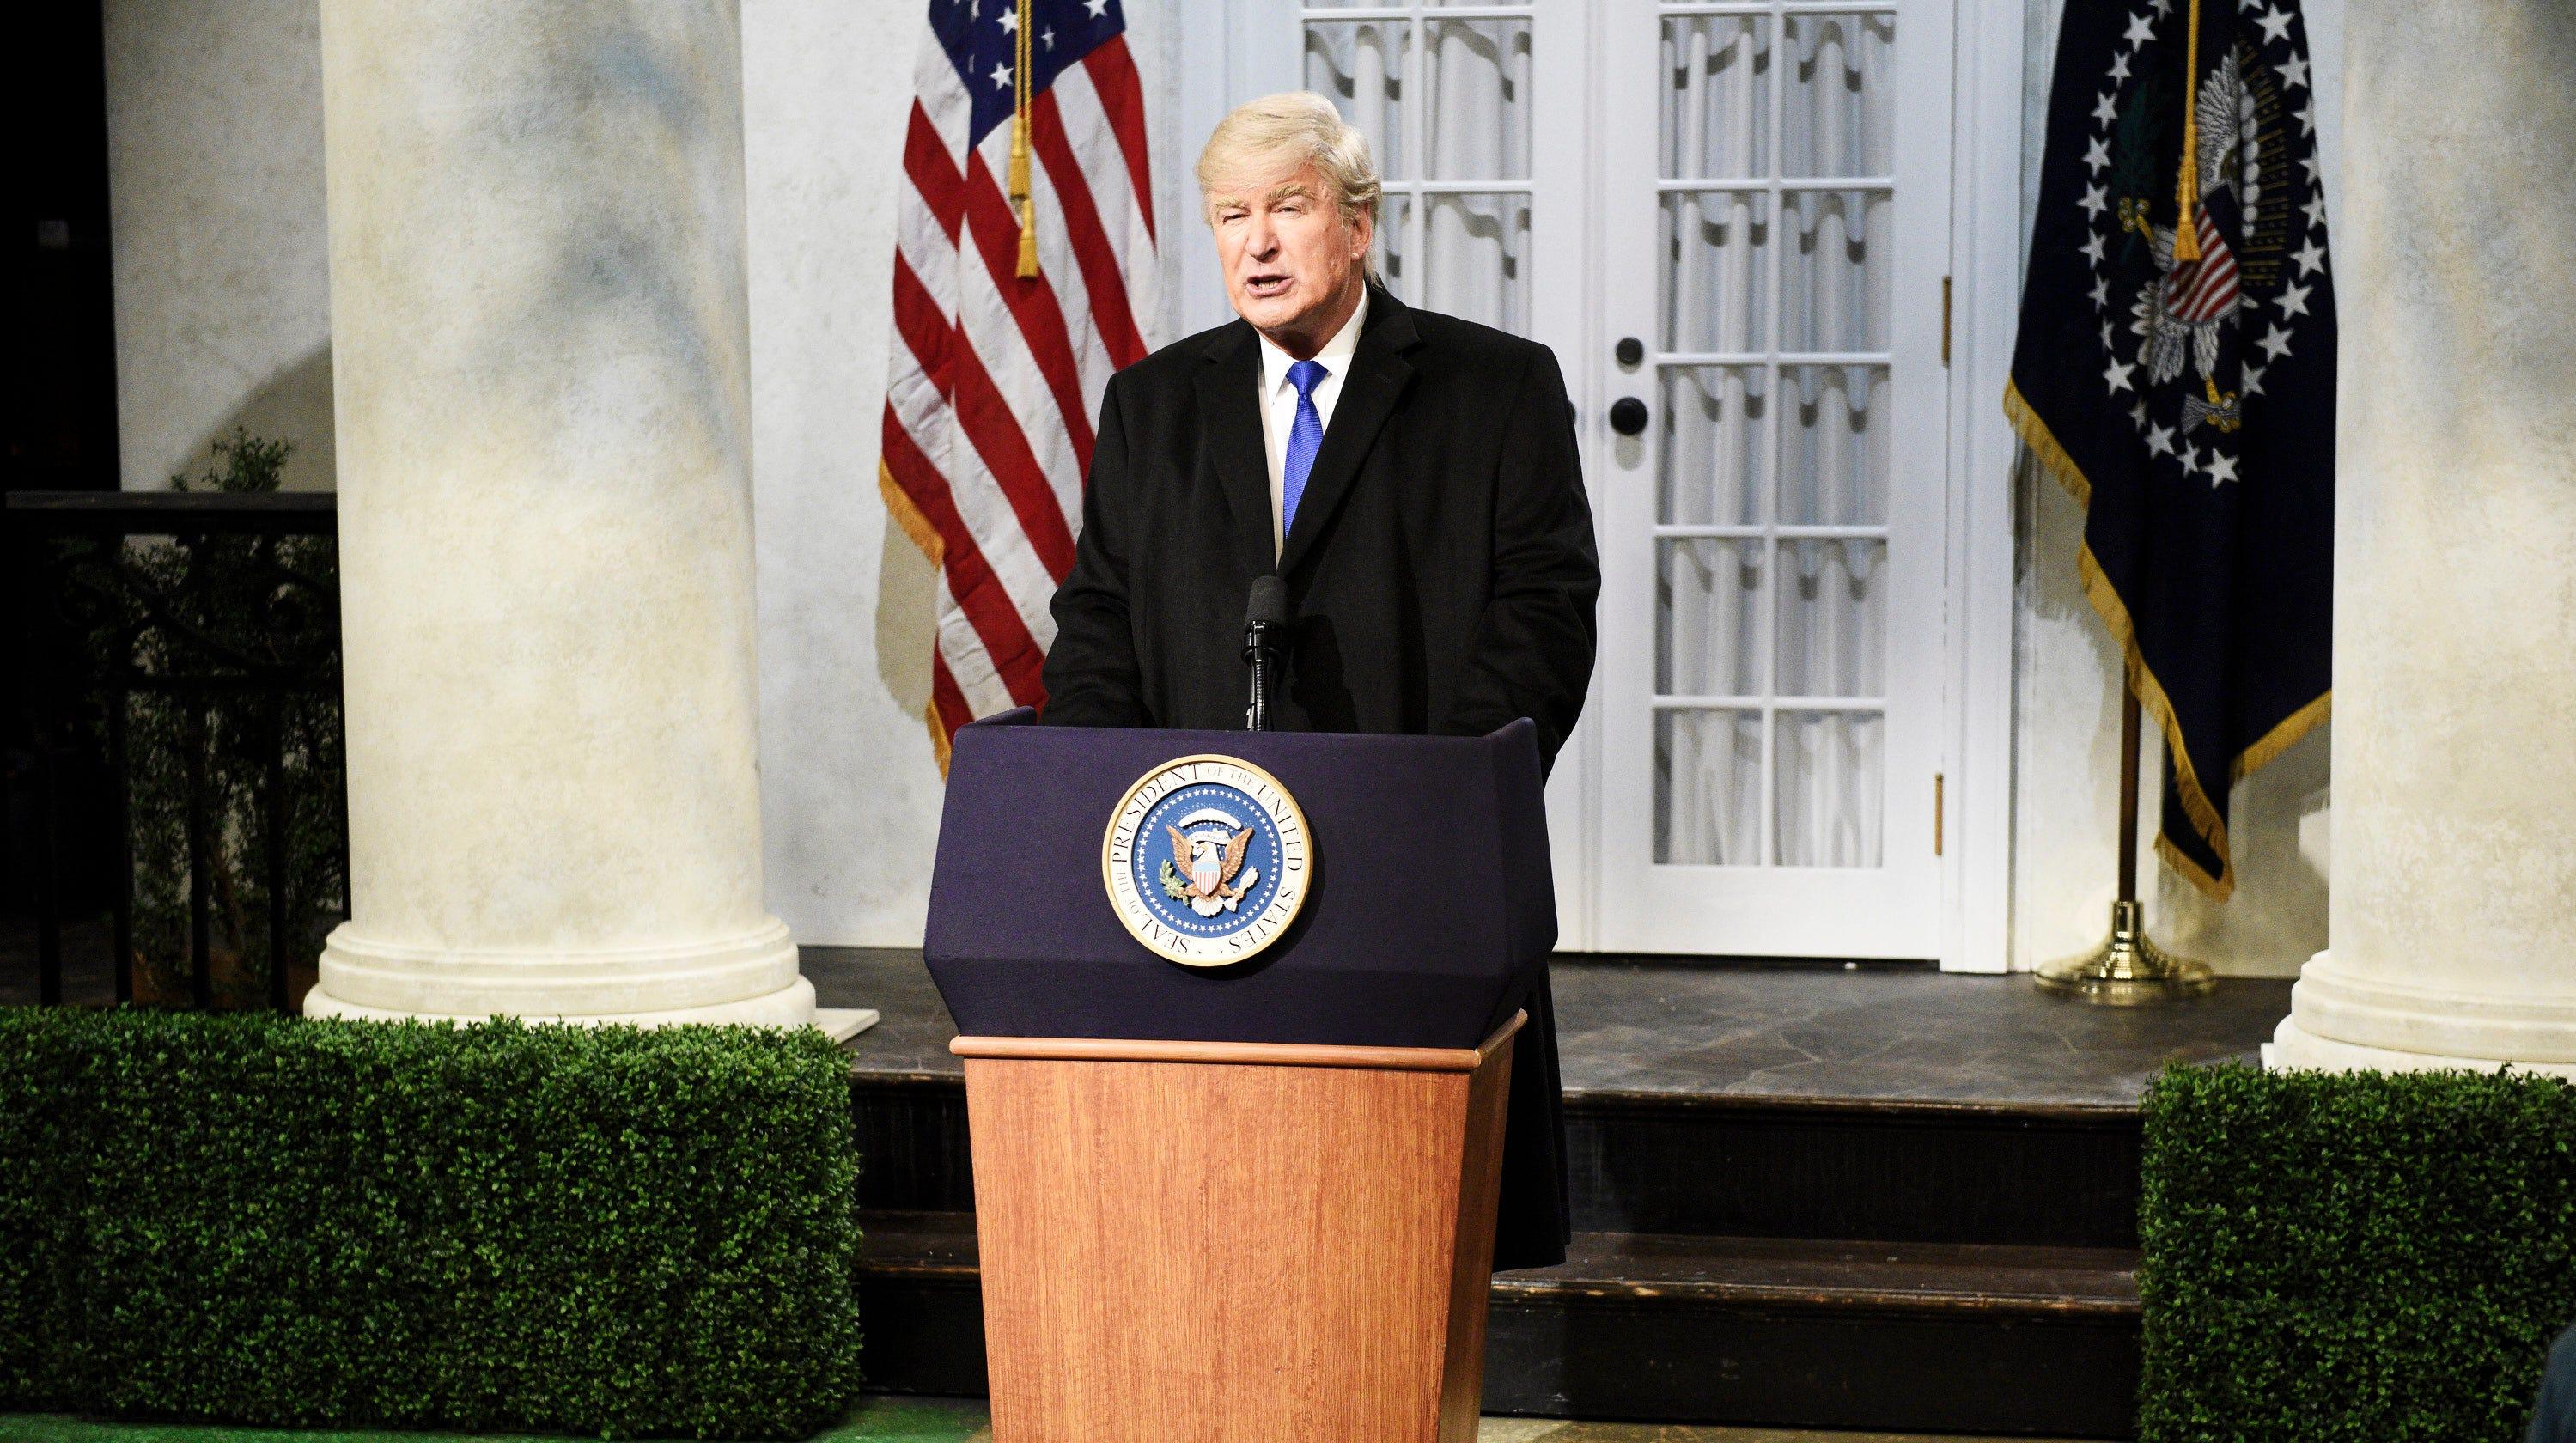 Alec Baldwin, Donald Trump Jr. exchange Twitter jabs over 'Saturday Night Live' skit - USA TODAY